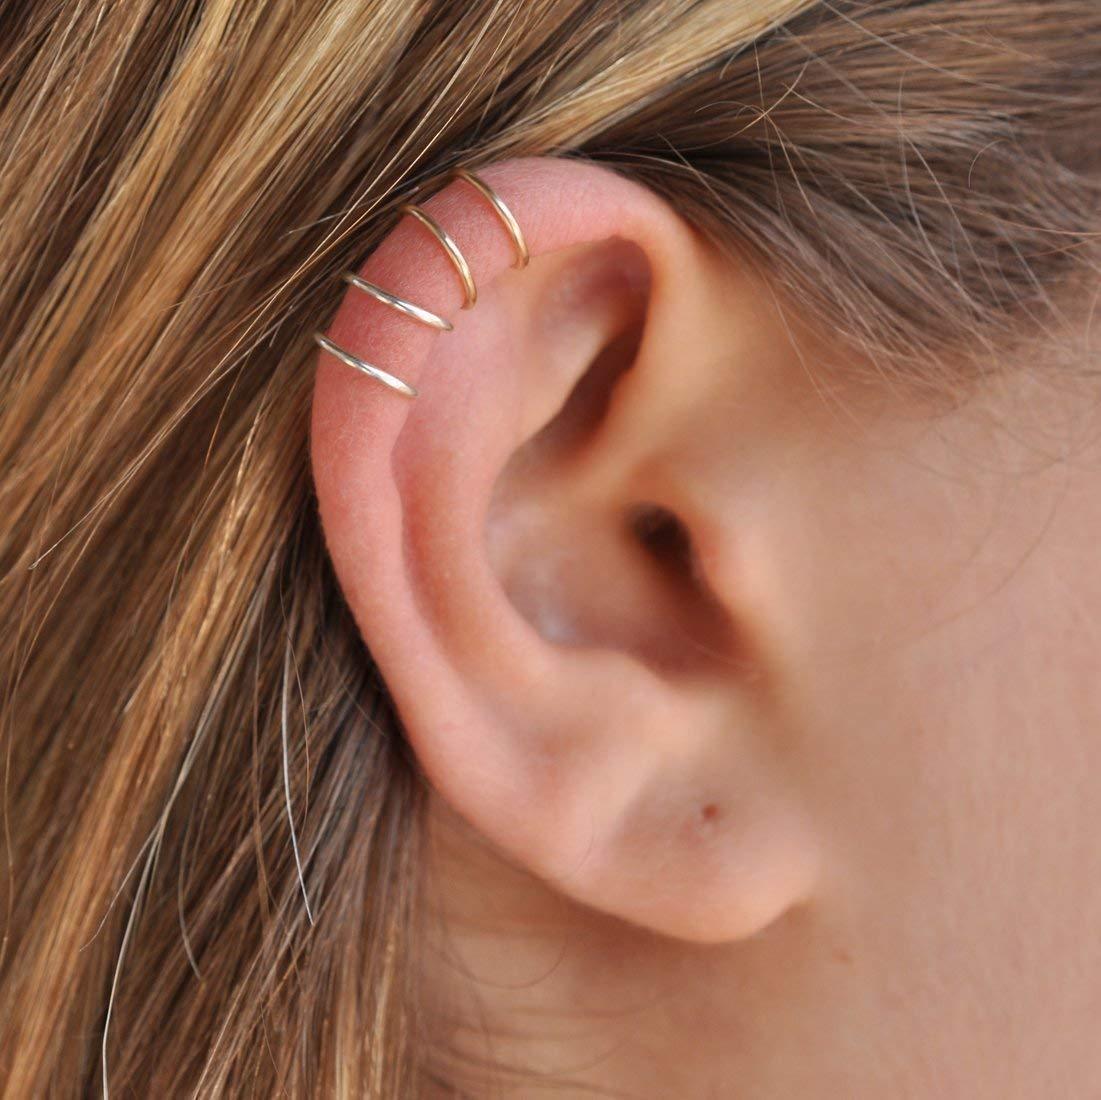 Set Of 2 Ear Cuffs Ear Cuff Double Ear Cuff Clip Cuff Non Piercing Cartilage Ear Cuff Simple Ear Cuff Fake Cartilage Earring 20 Gauge Gold